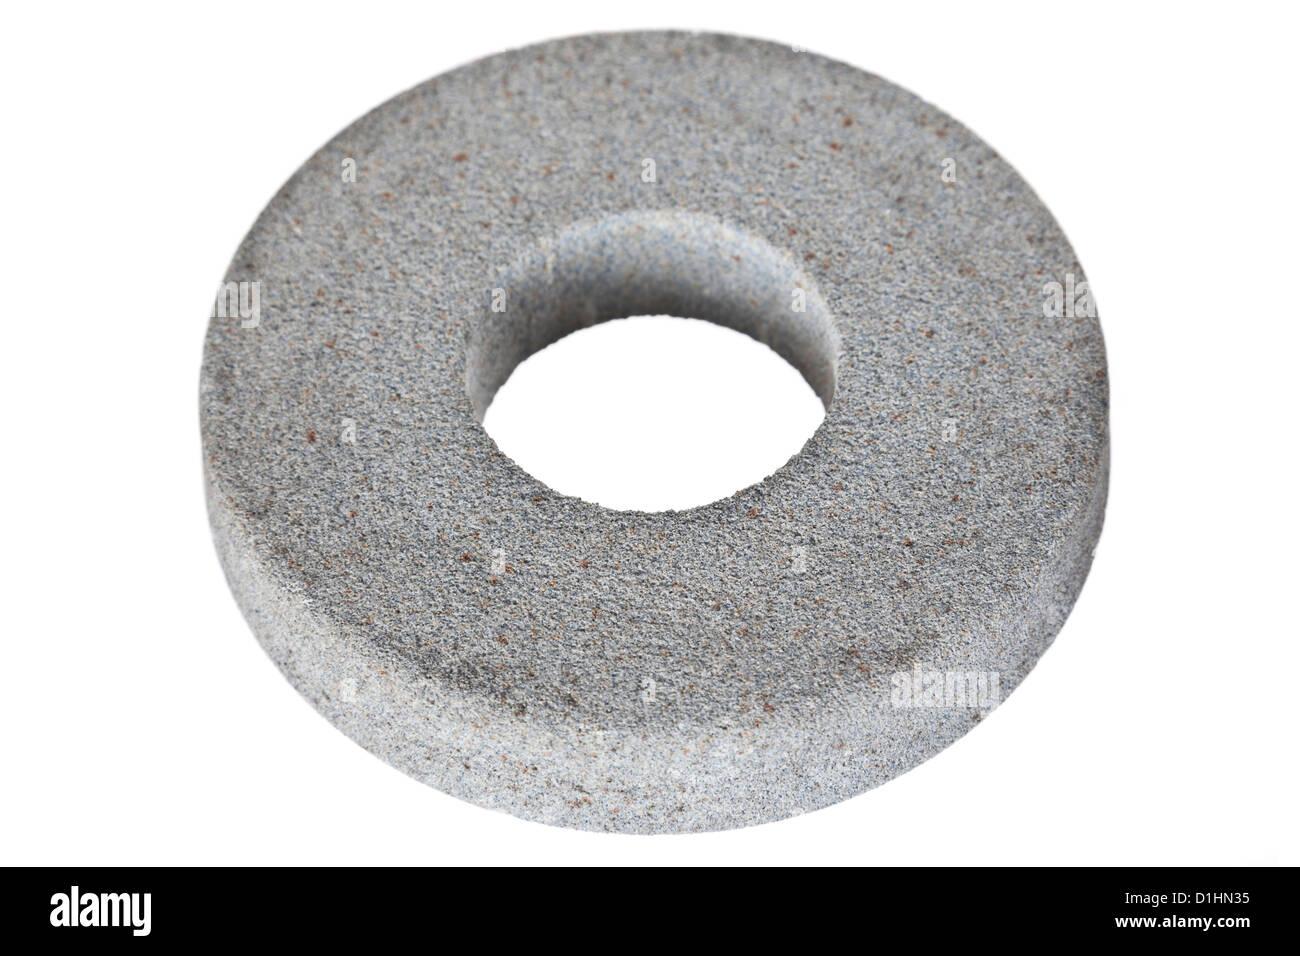 Circular abrasive disk - emery isolated on white background - Stock Image